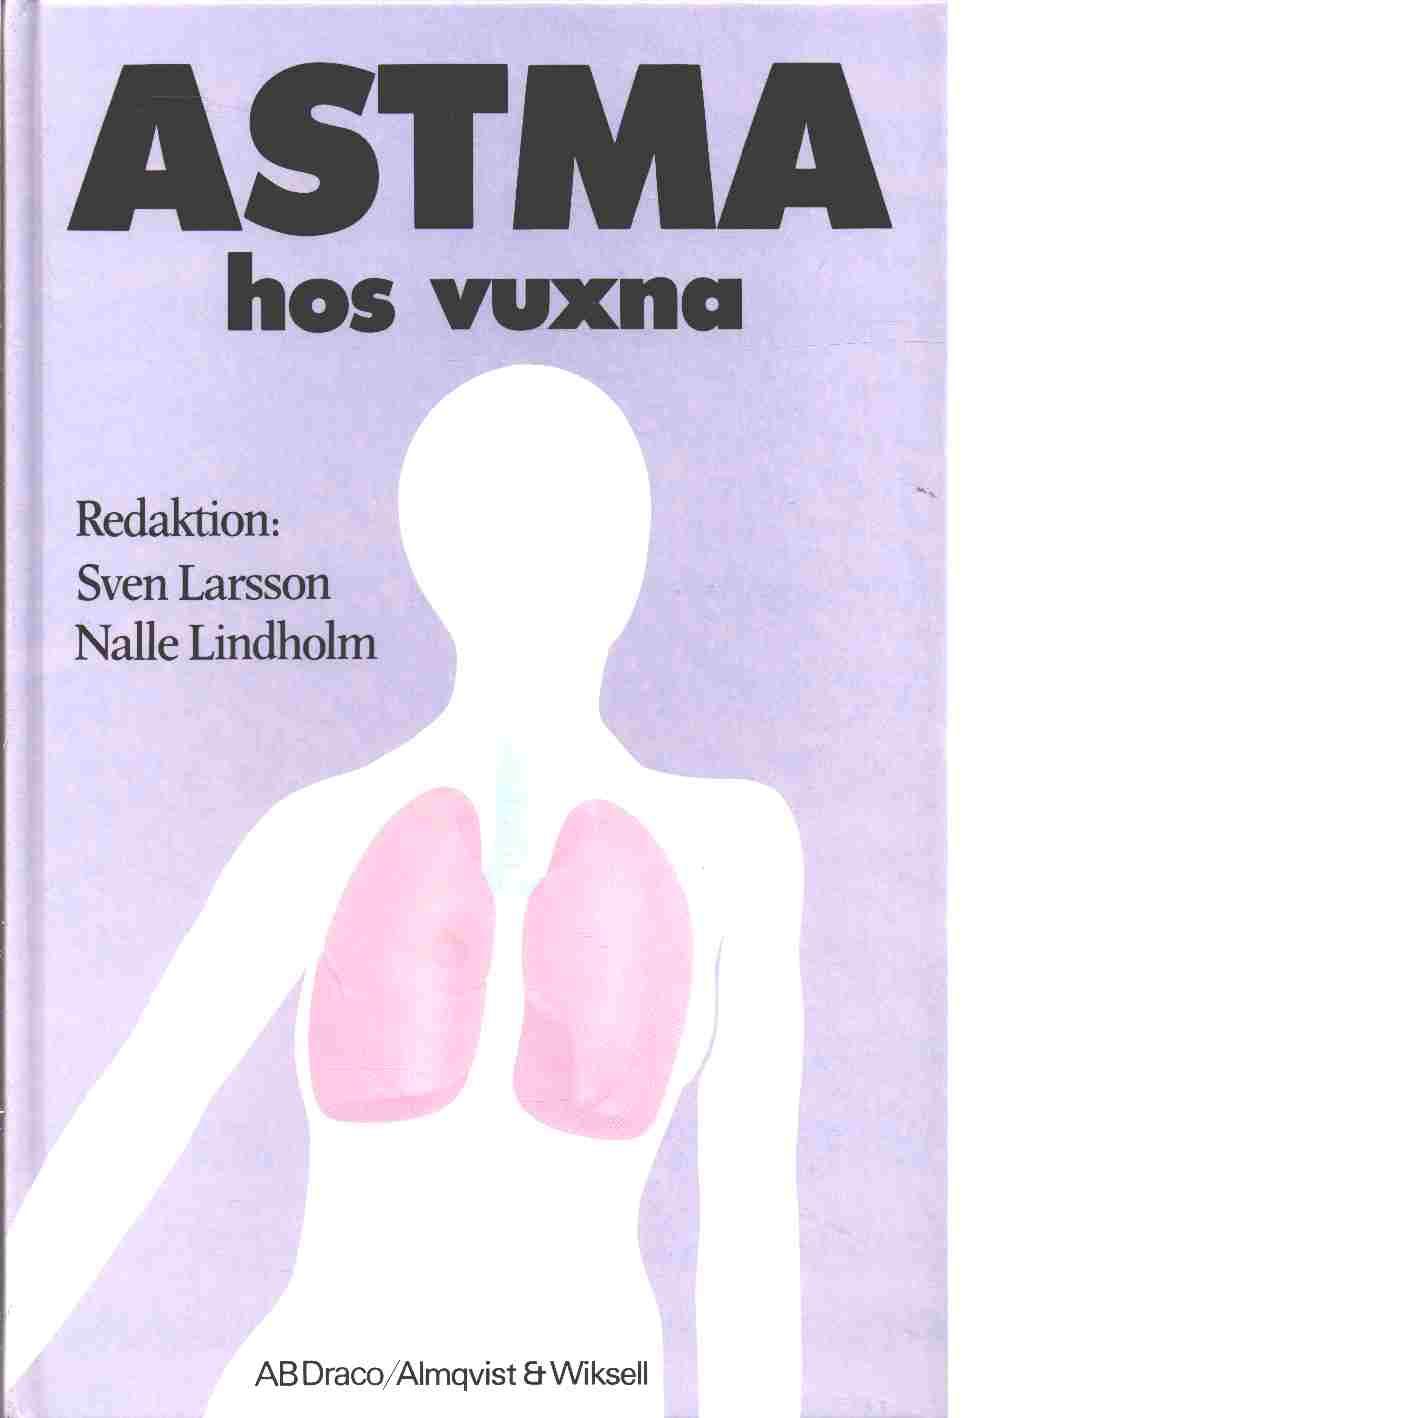 Astma hos vuxna - Red. Larsson, Sven och Lindholm, Nalle